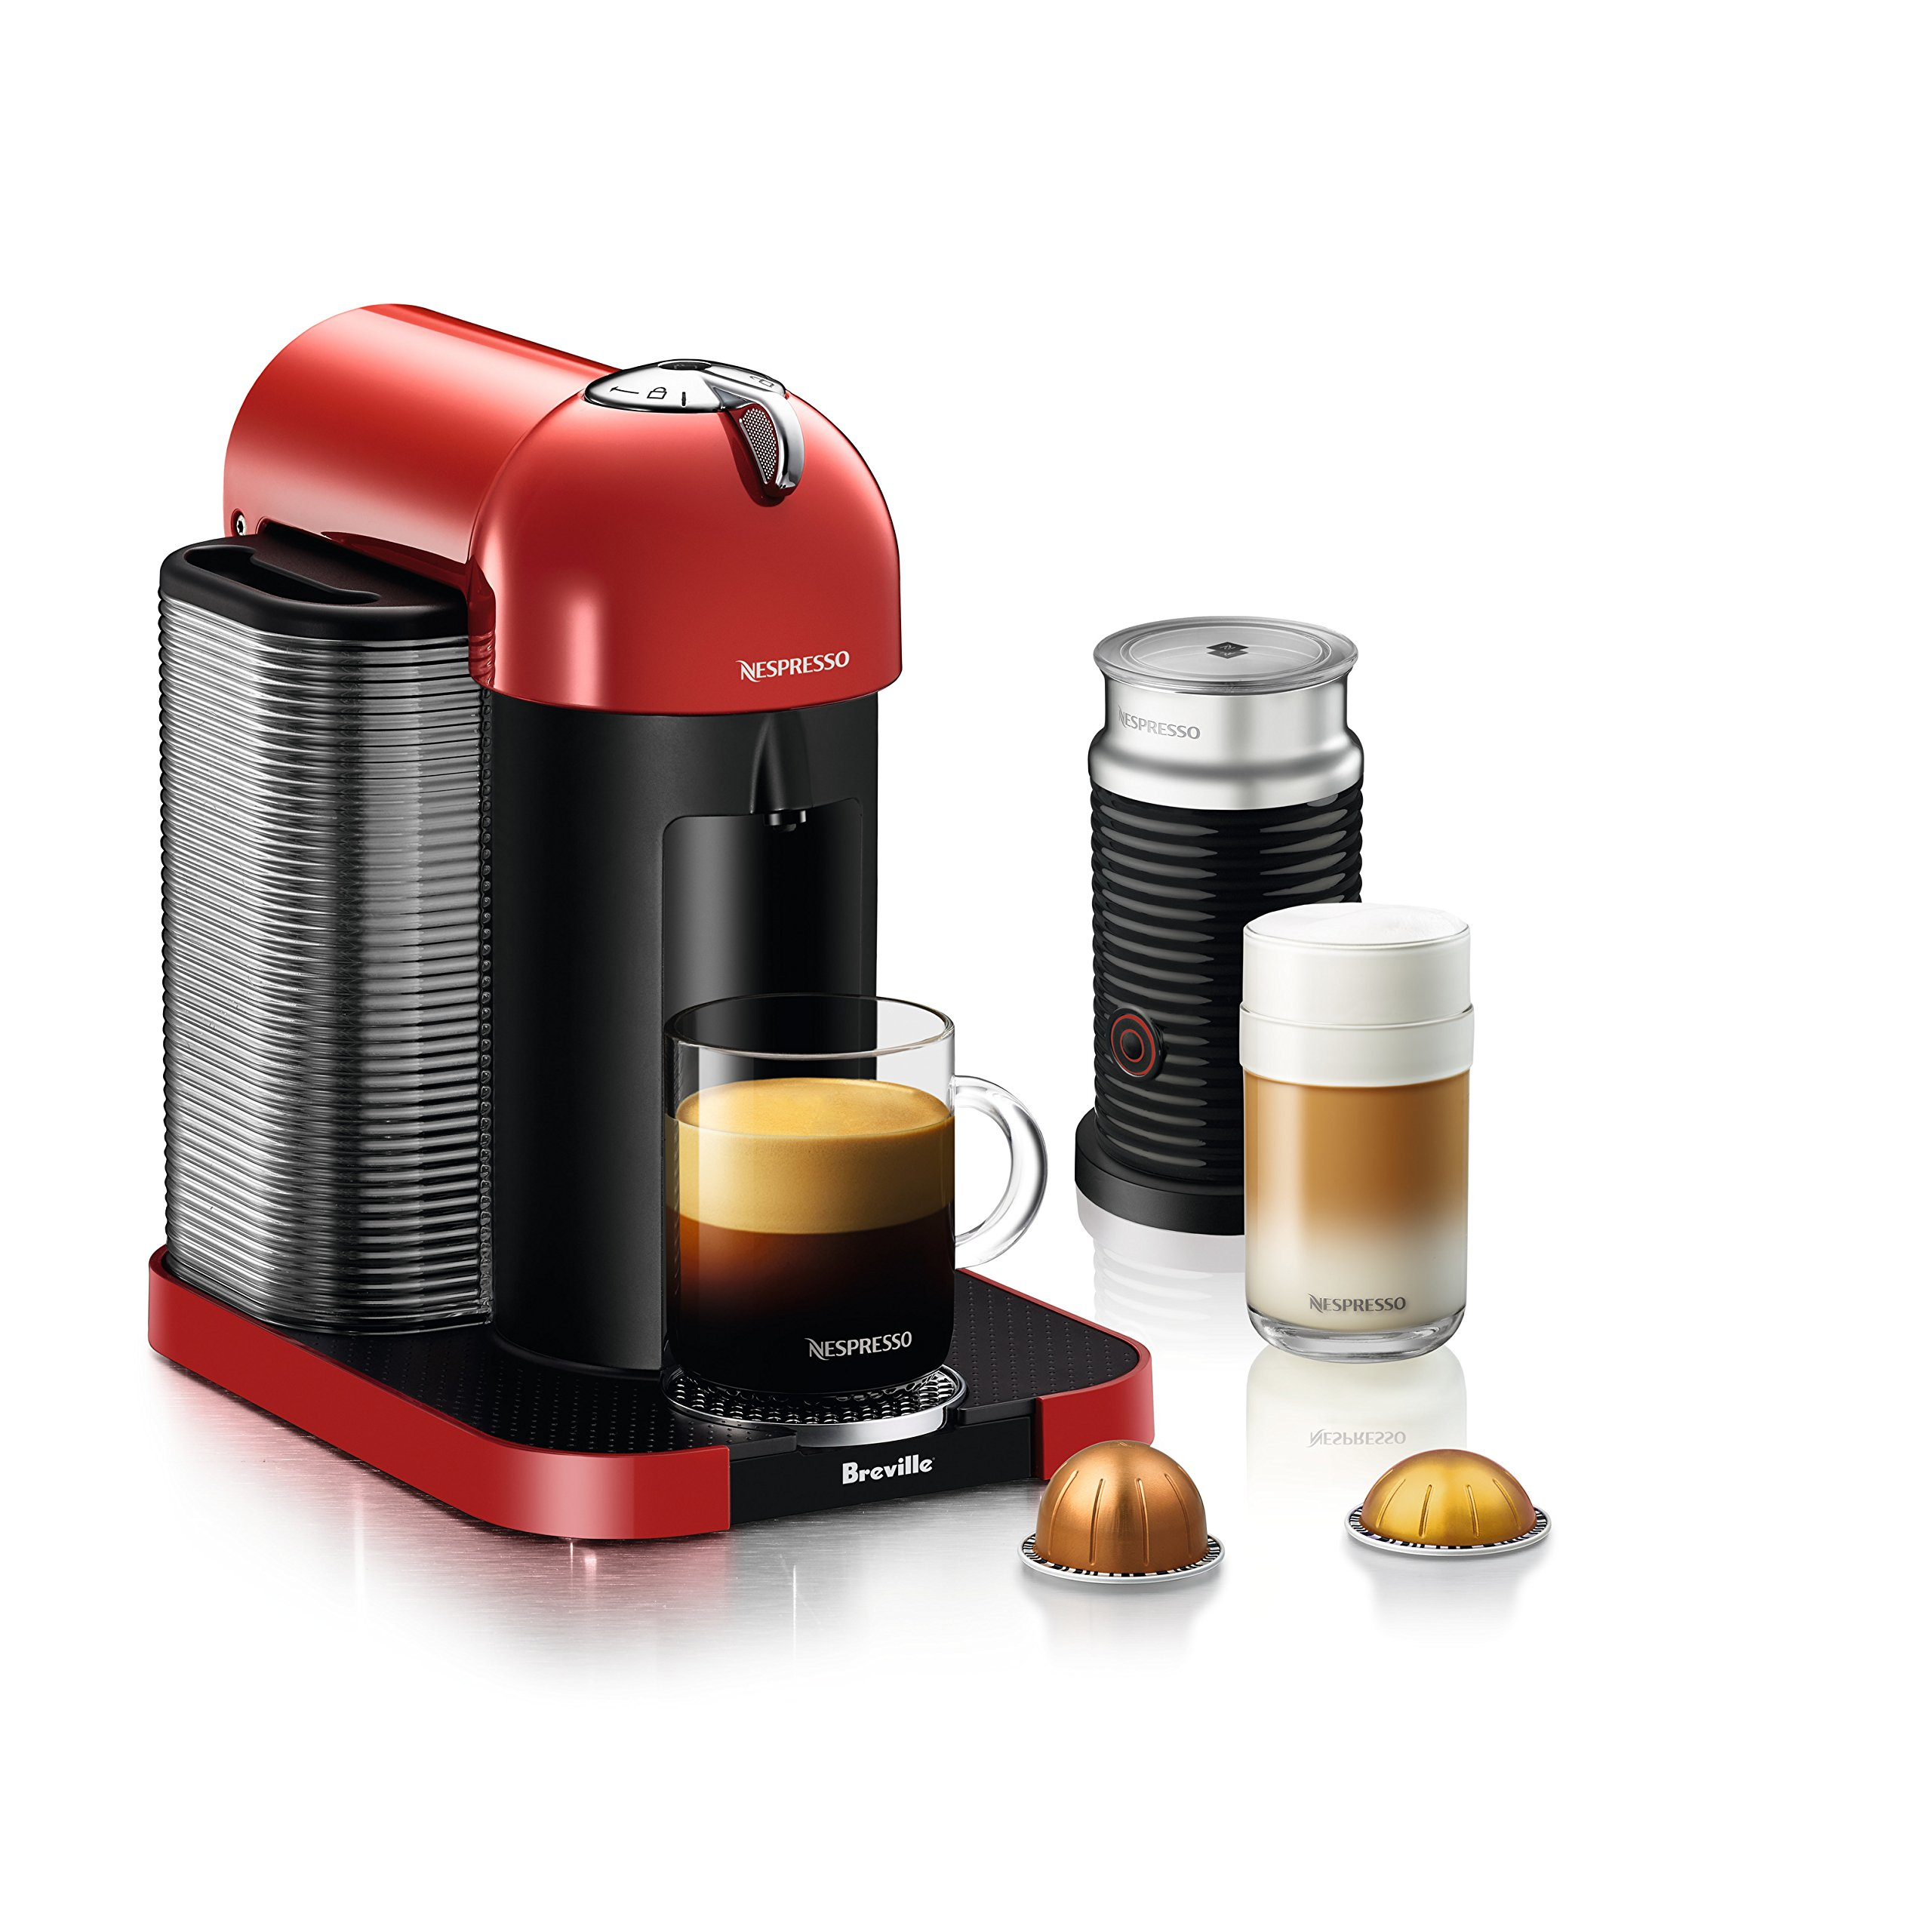 Nespresso Vertuo Coffee and Espresso Machine by Breville with Aeroccino, Red by Breville (Image #1)